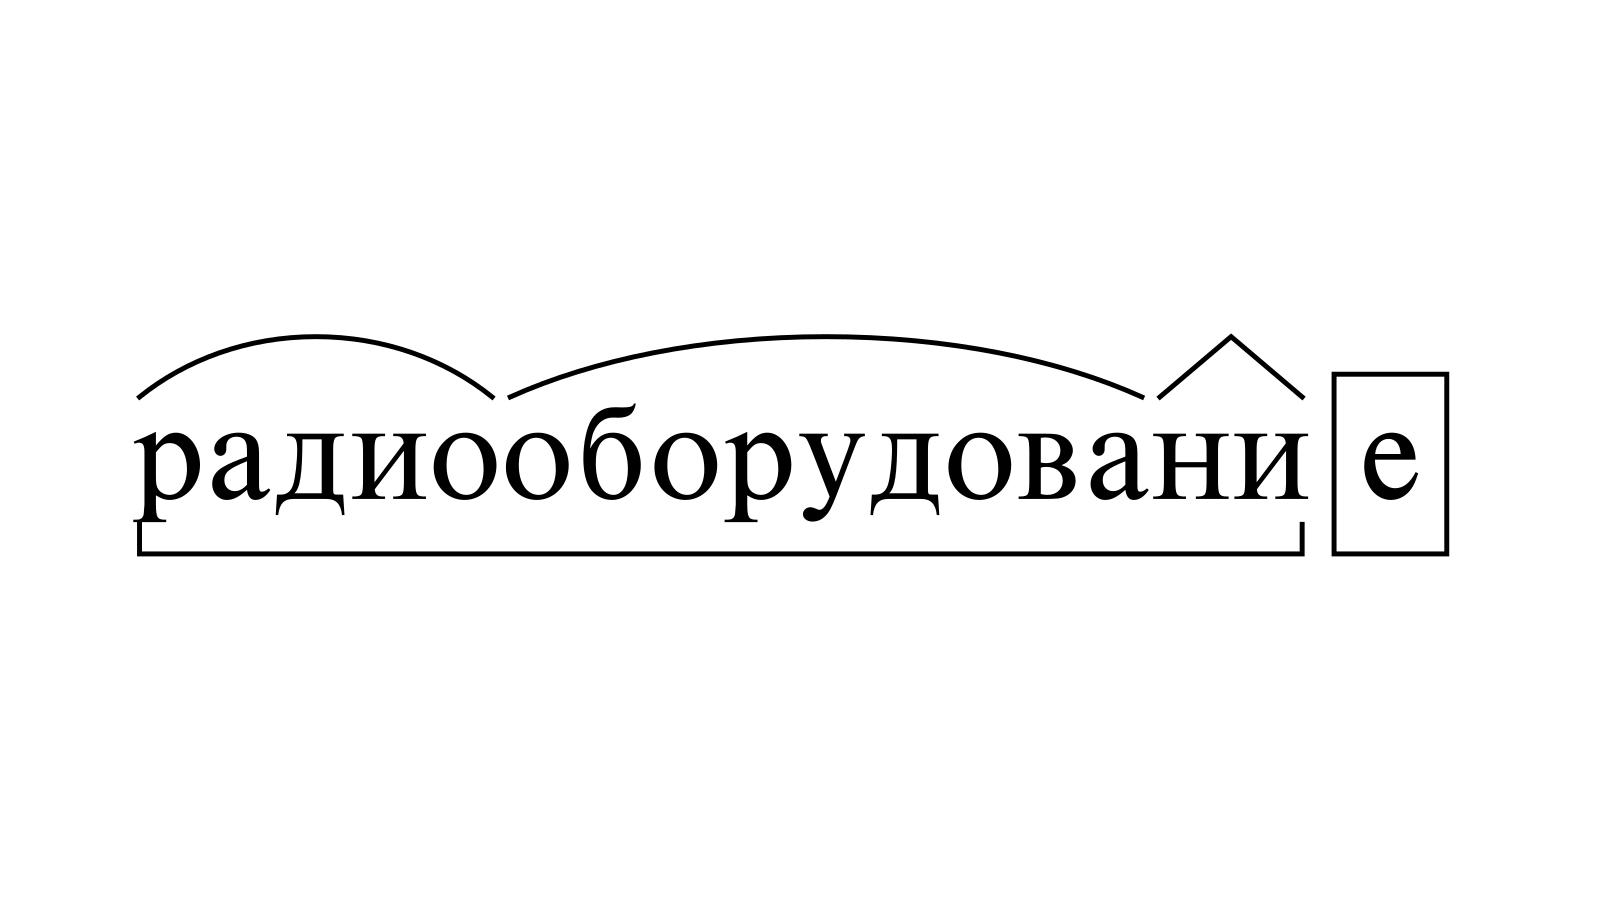 Разбор слова «радиооборудование» по составу